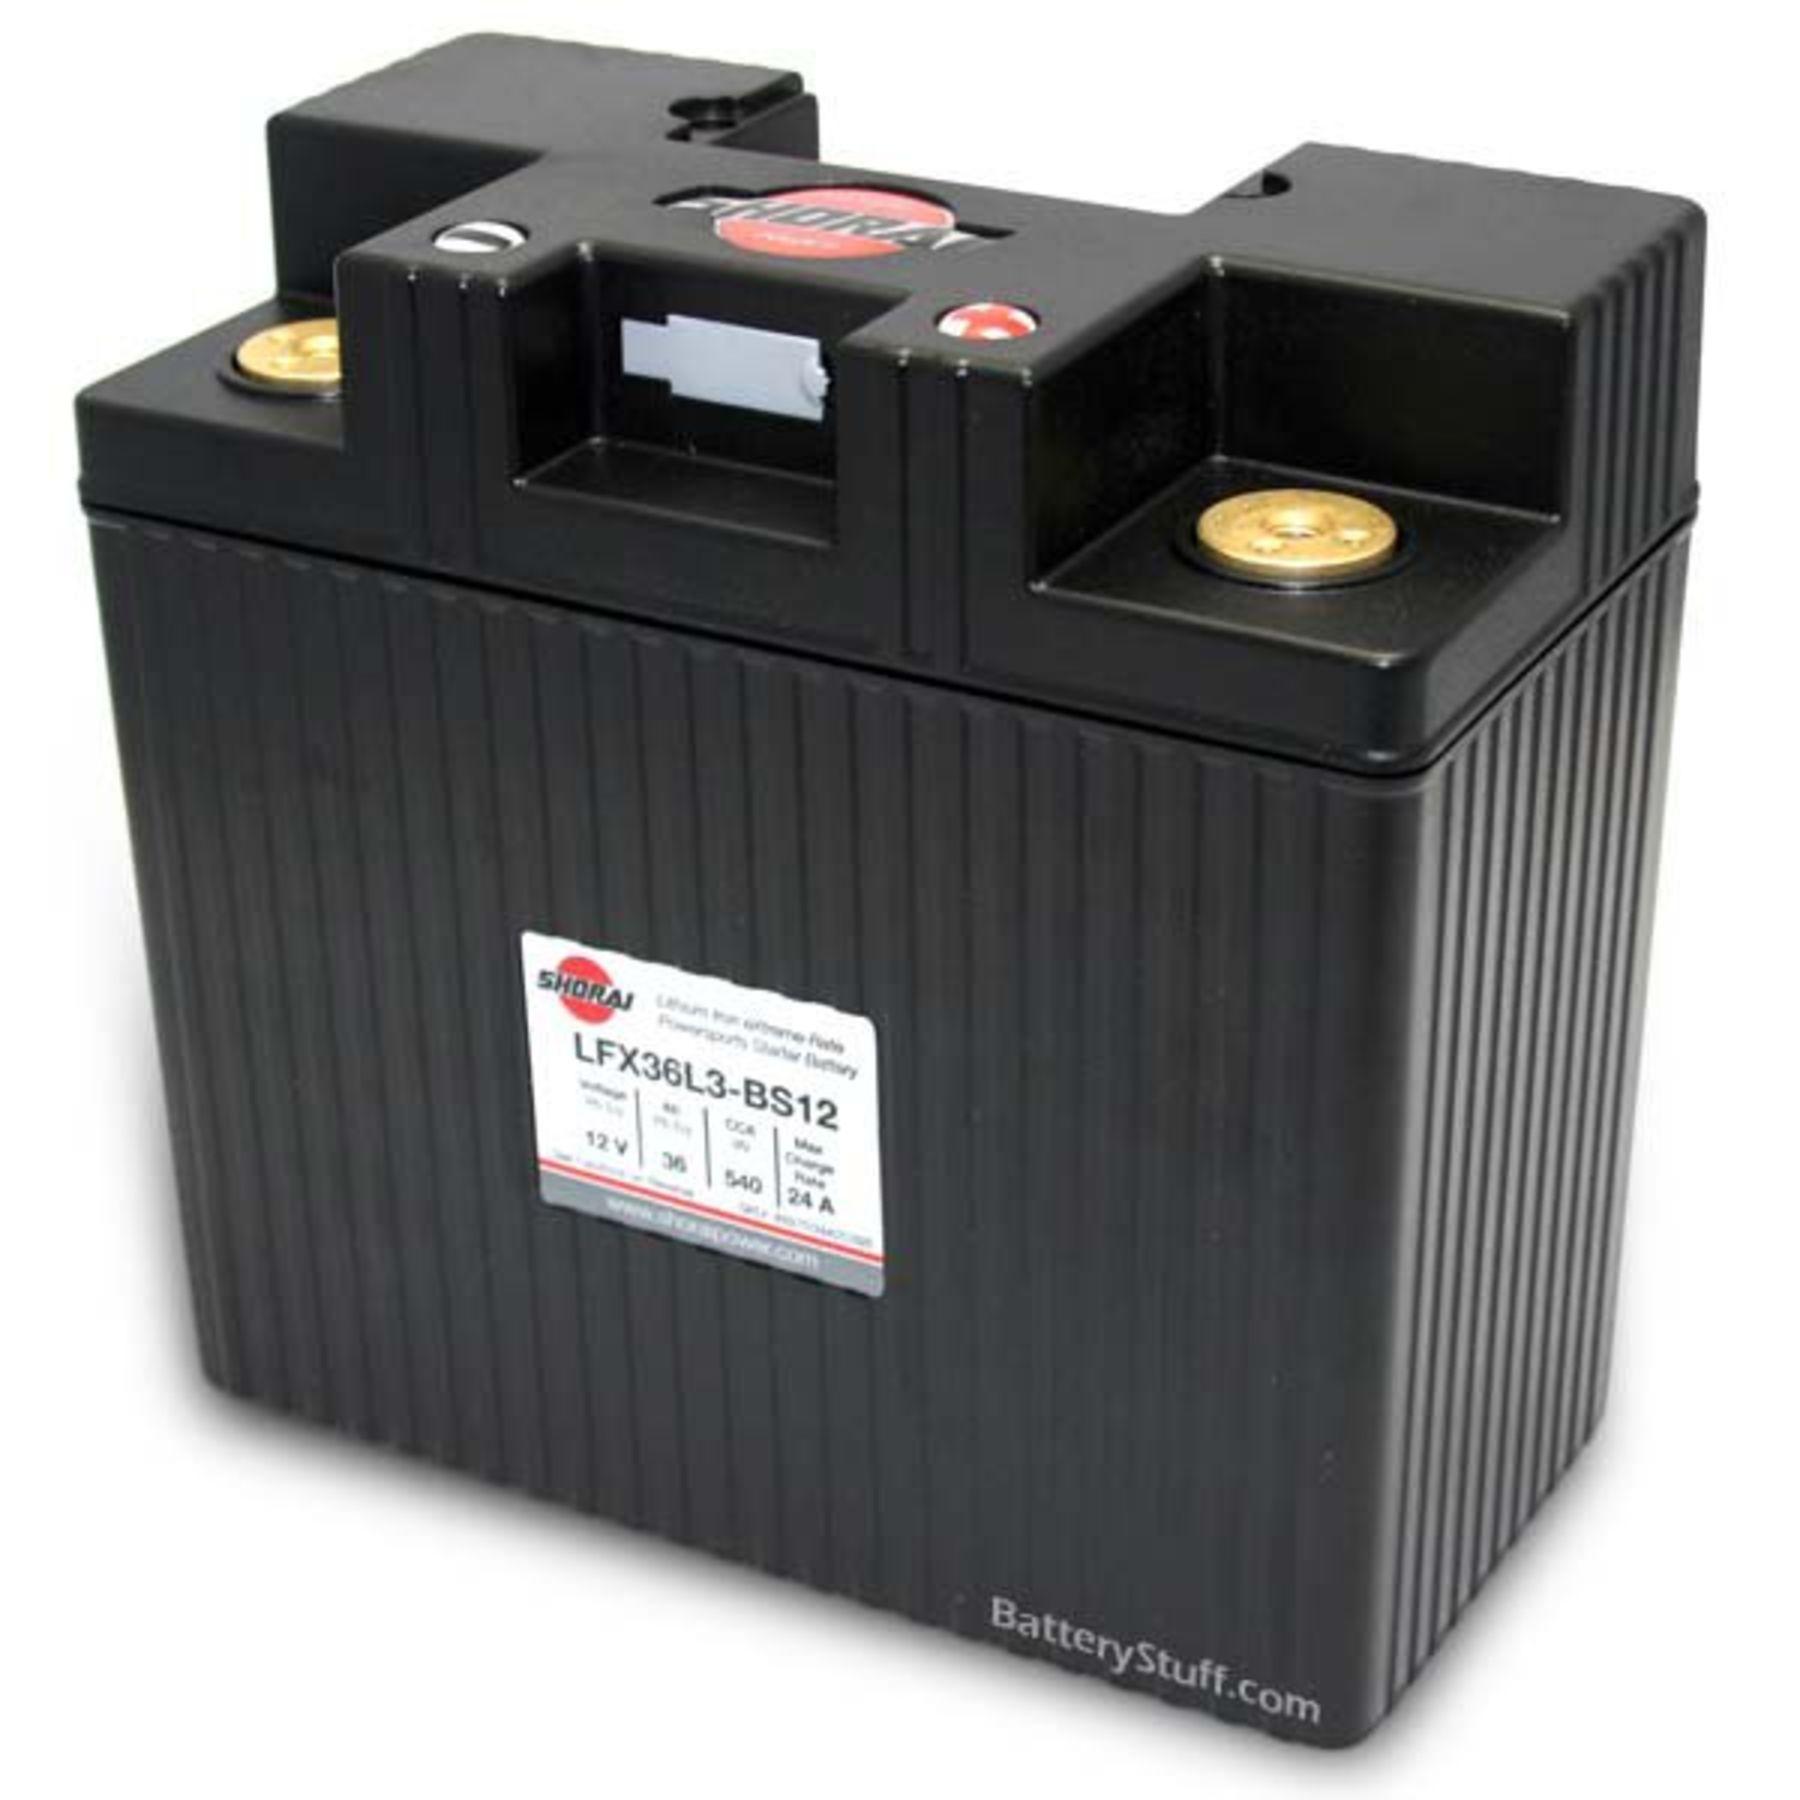 LiFePO4 Battery | 36ah 12v Lithium Motorcycle / ATV Batteries LFX36L3-BS12